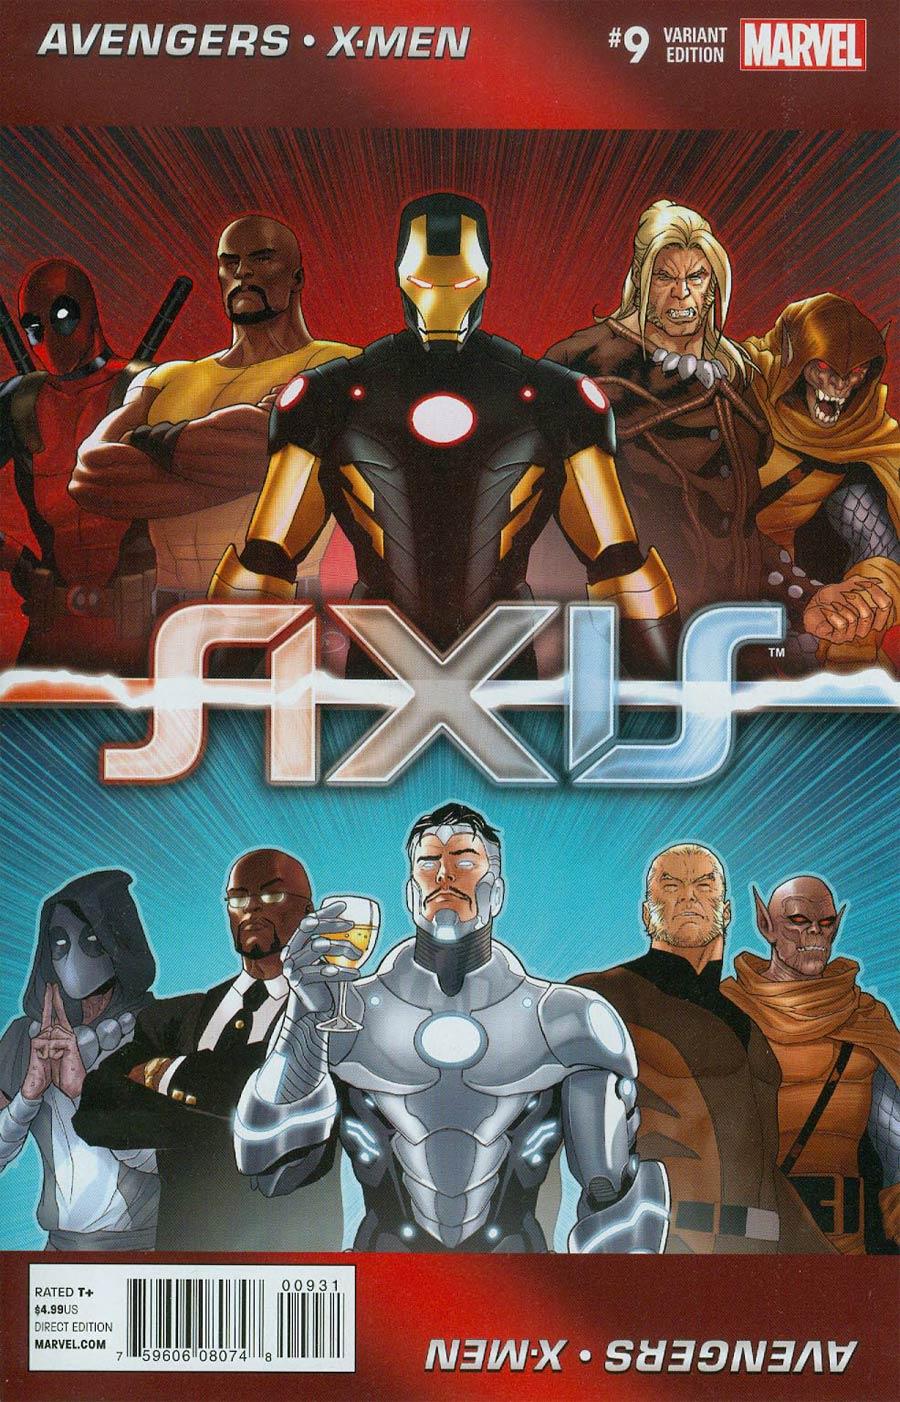 Avengers & X-Men AXIS #9 Cover B Incentive Paul Renaud Looper Variant Cover